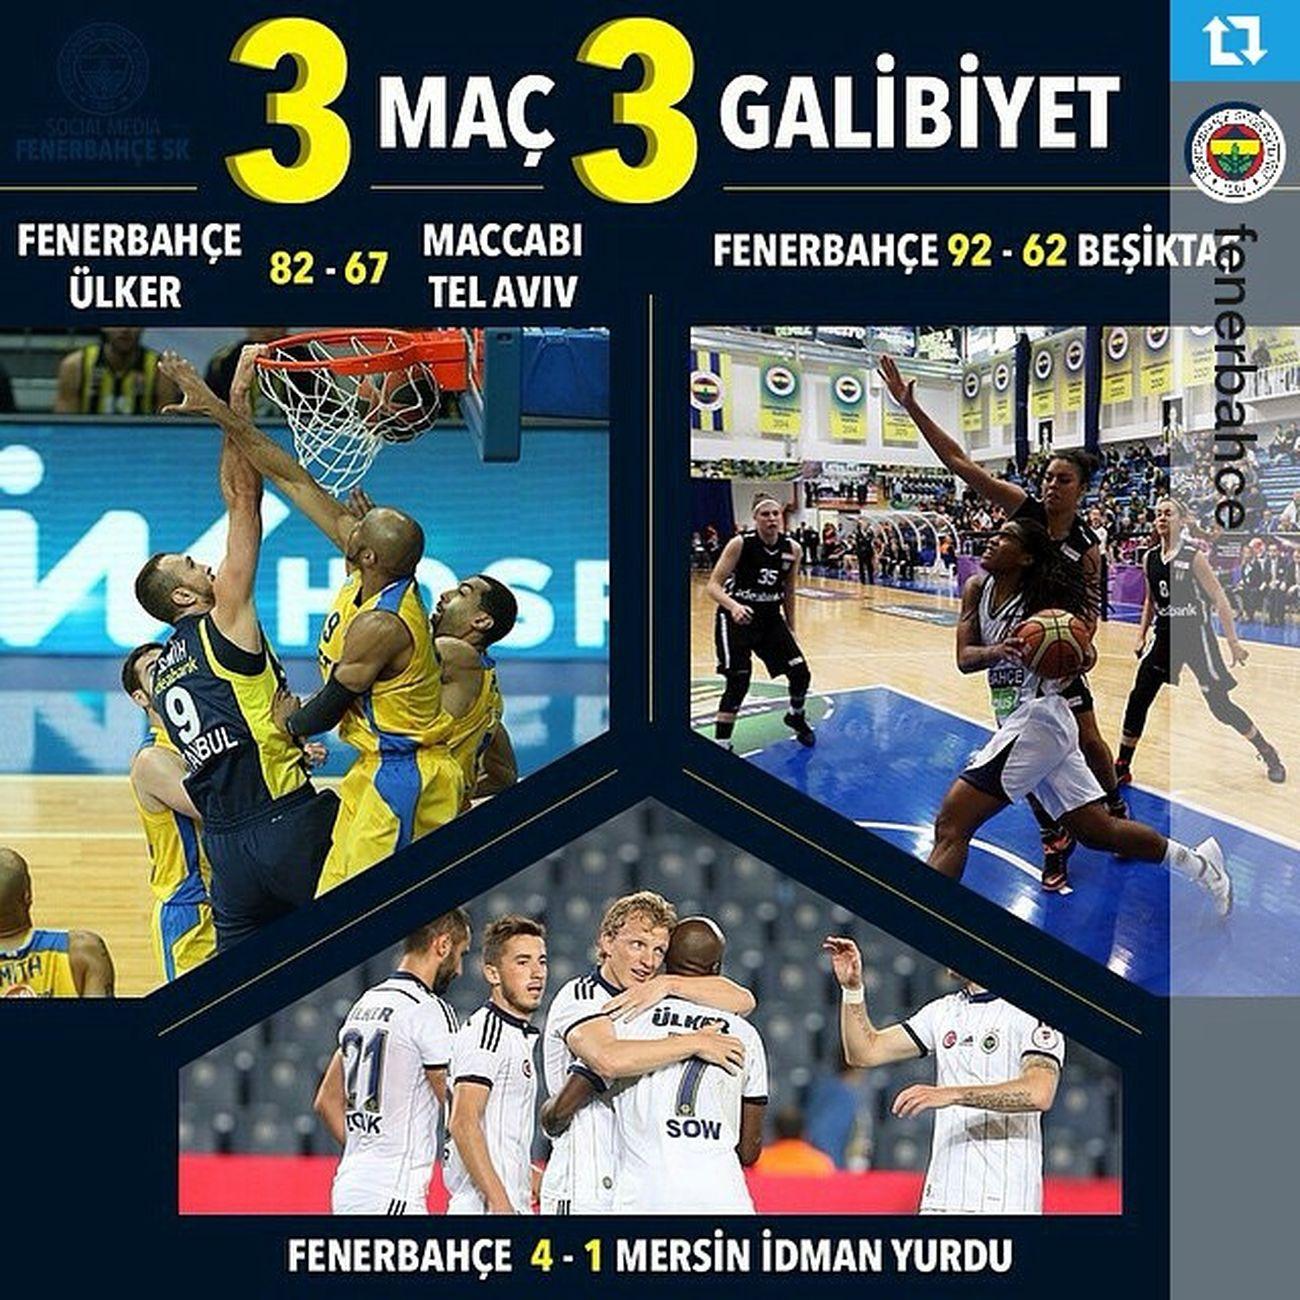 Repost @fenerbahce ・・・ 3 Maç 3 Galibiyet! Tebrikler Fenerbahce  !! InstaFB